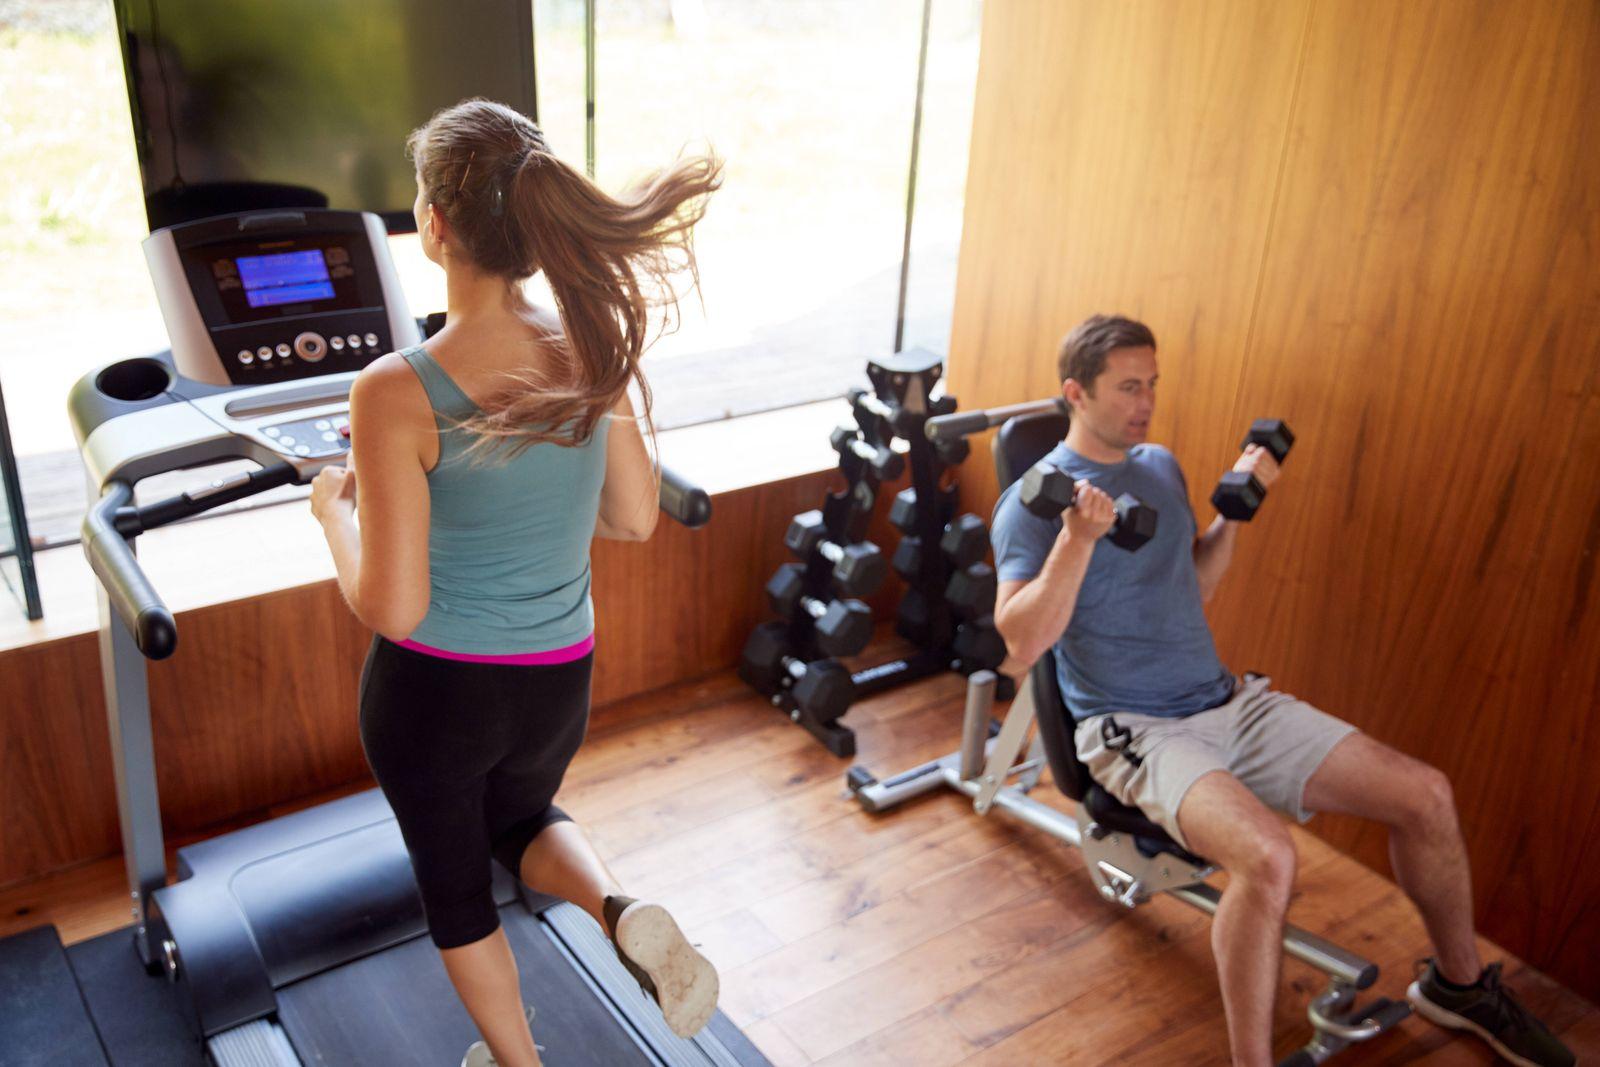 training,fitnessstudio *** sports training,gym mmq-yd4,model released, Symbolfoto